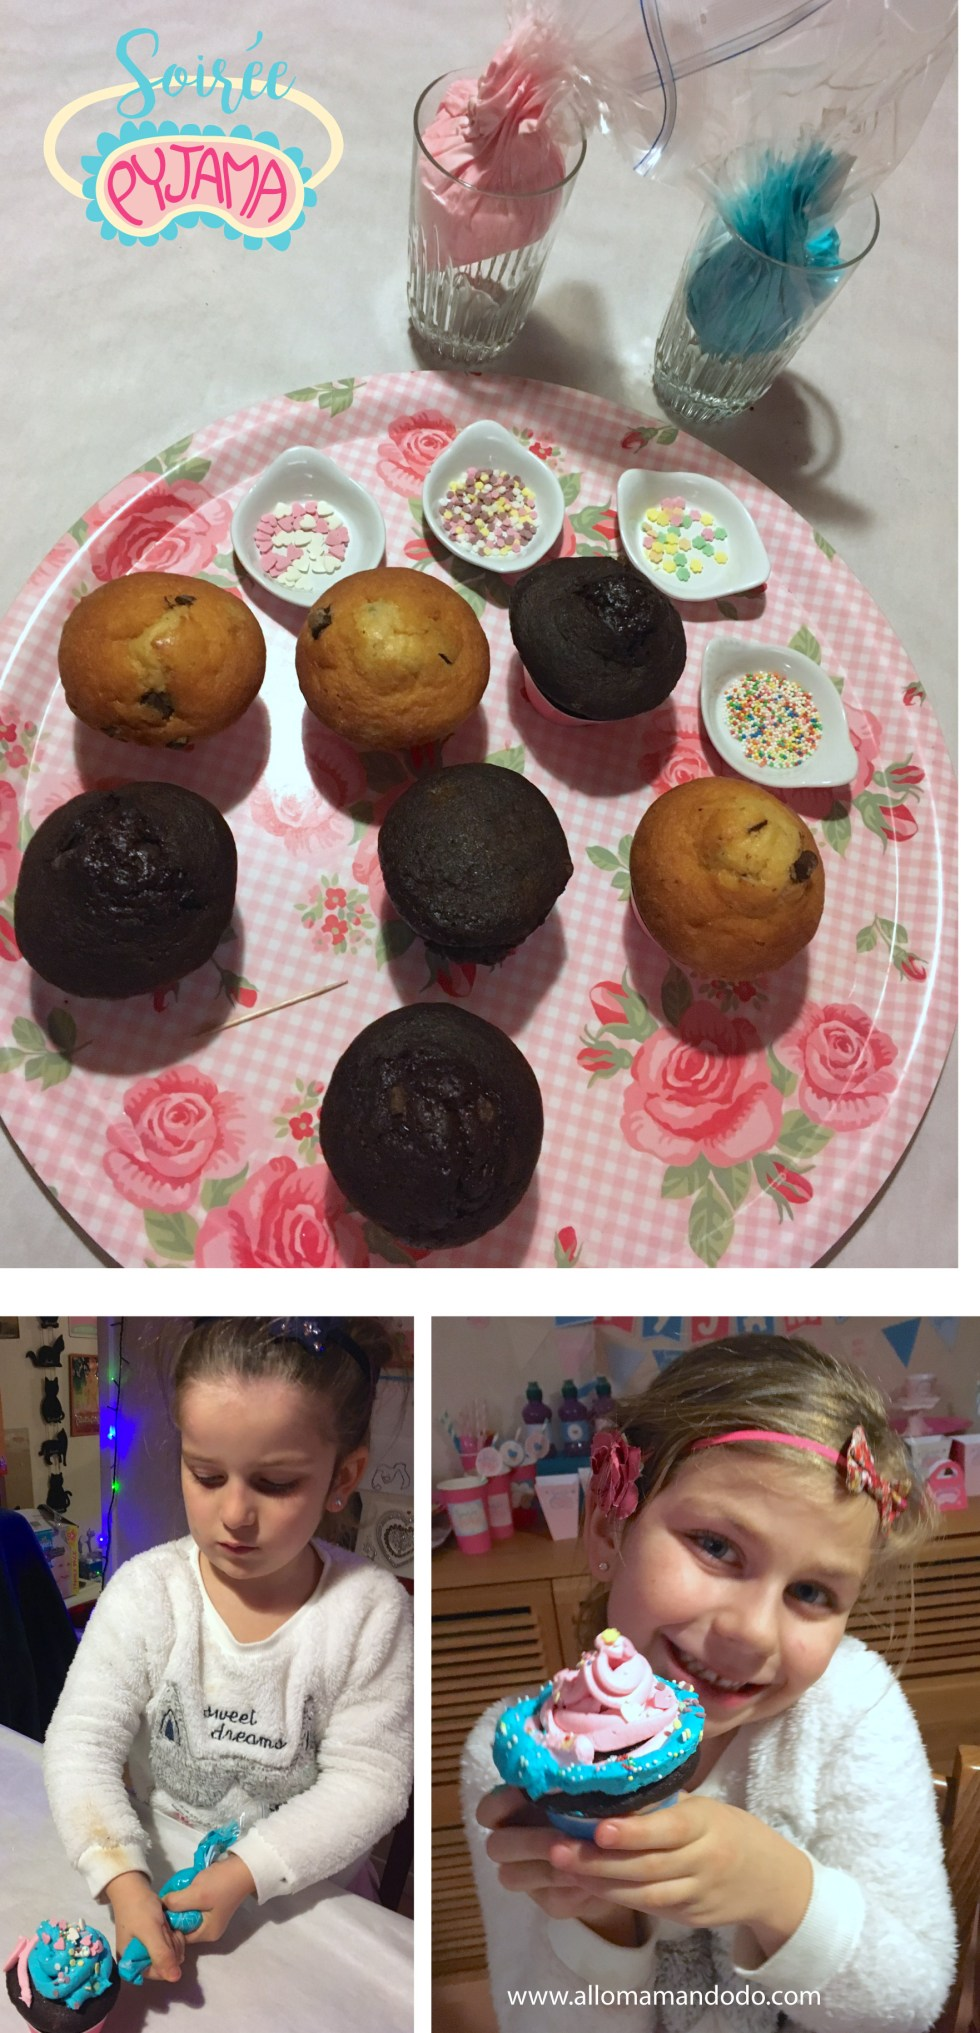 soirée pyjama déco cupcakes